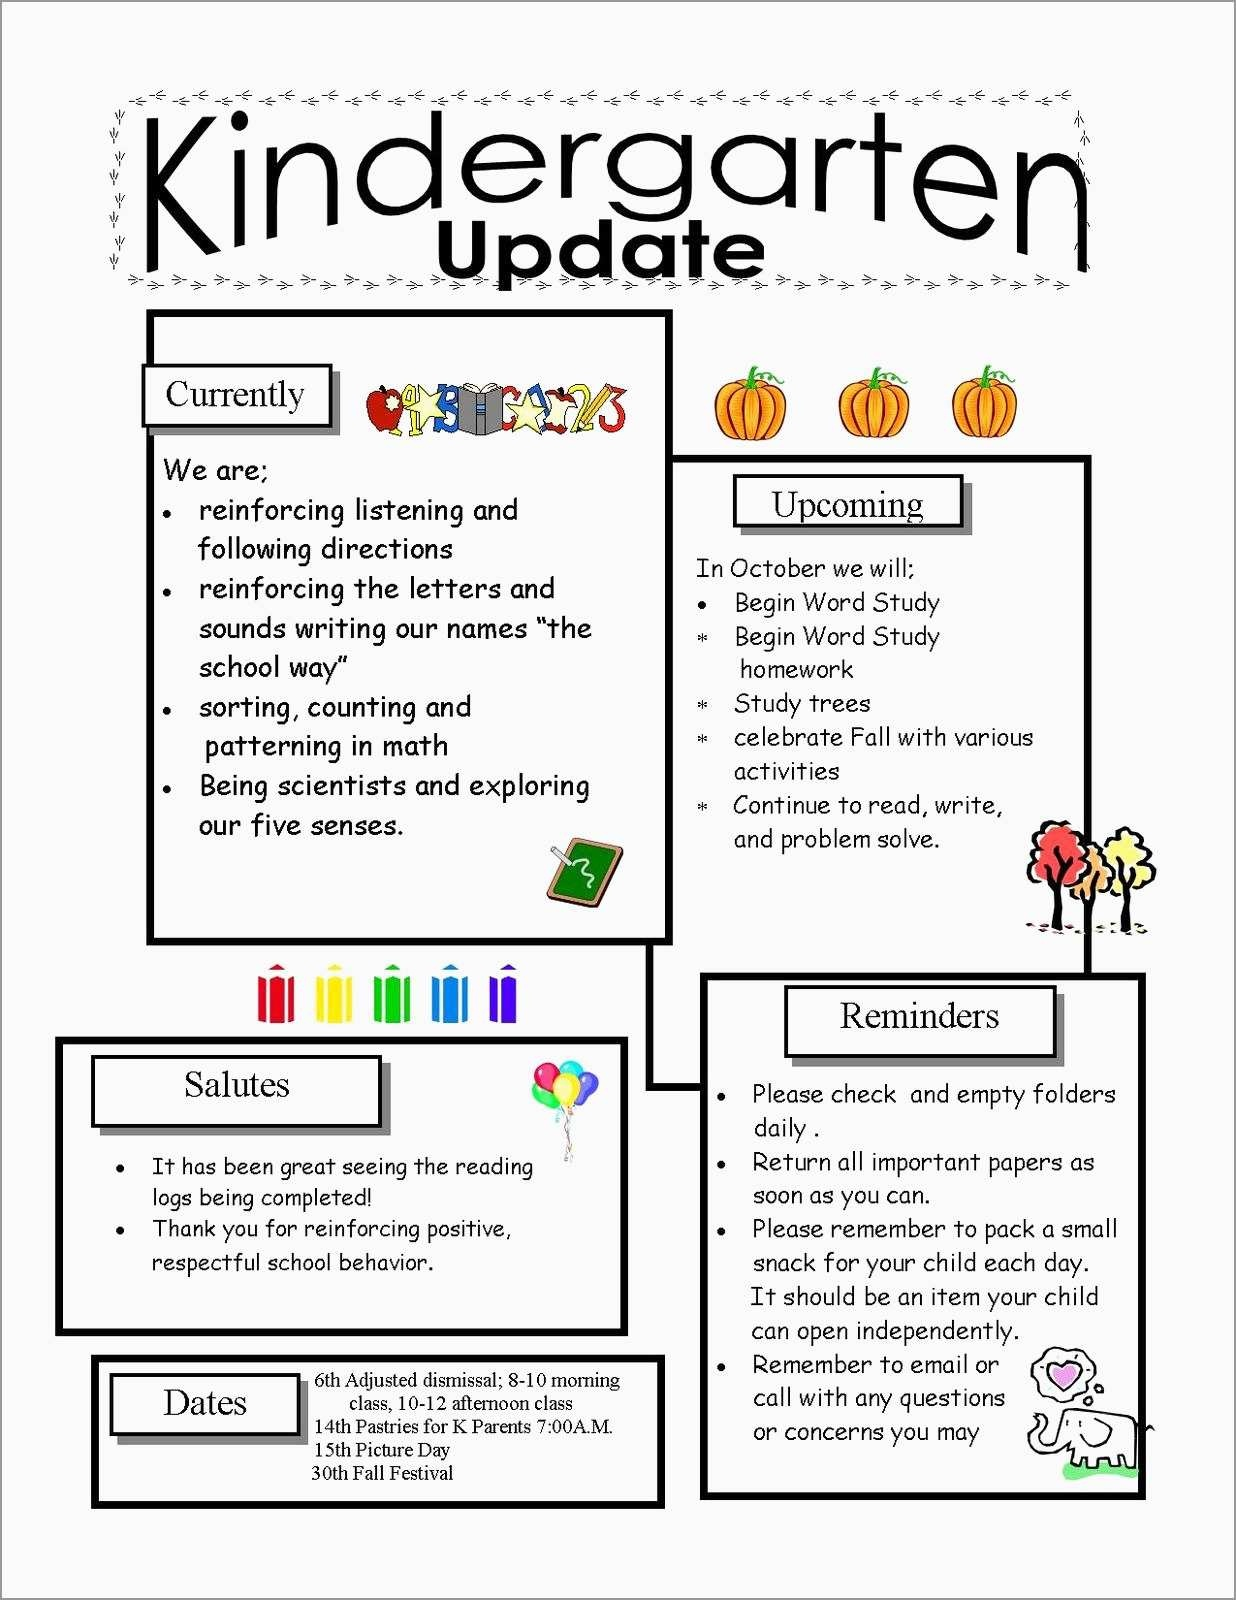 Free Printable Preschool Newsletter Templates New Preschool - Free Printable Kindergarten Newsletter Templates